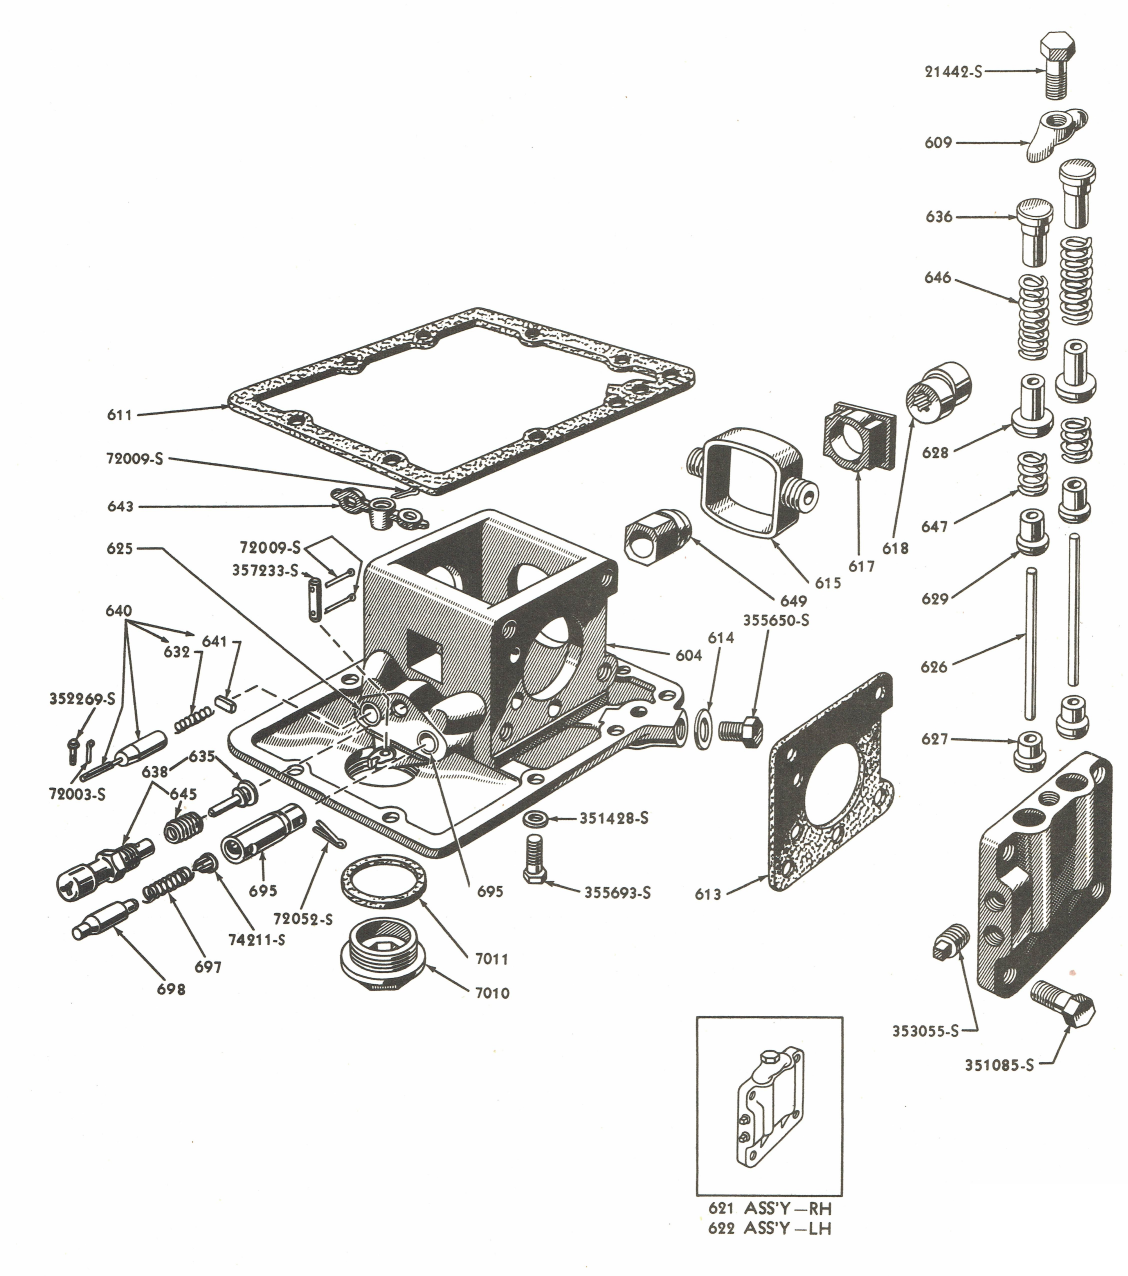 [DIAGRAM] 1949 Ford 8n Wiring Diagram For